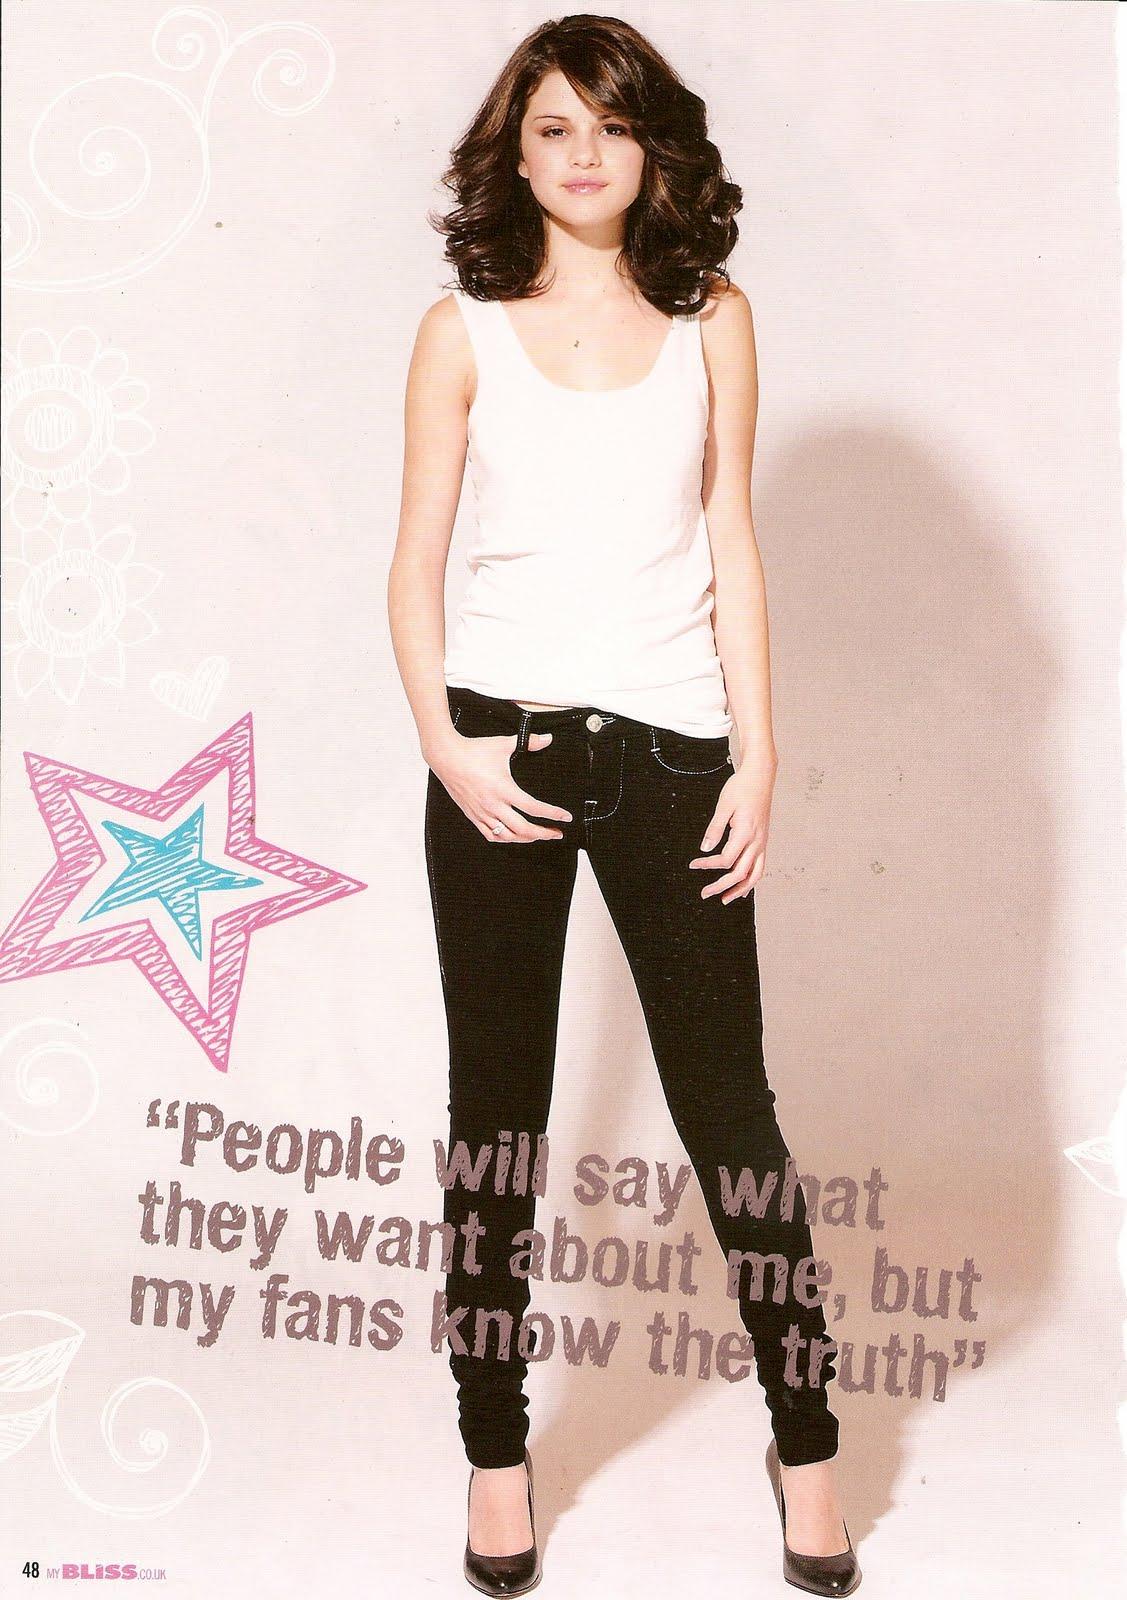 Selena Gomez Winks Her Way Onto i-D Magzine Cover